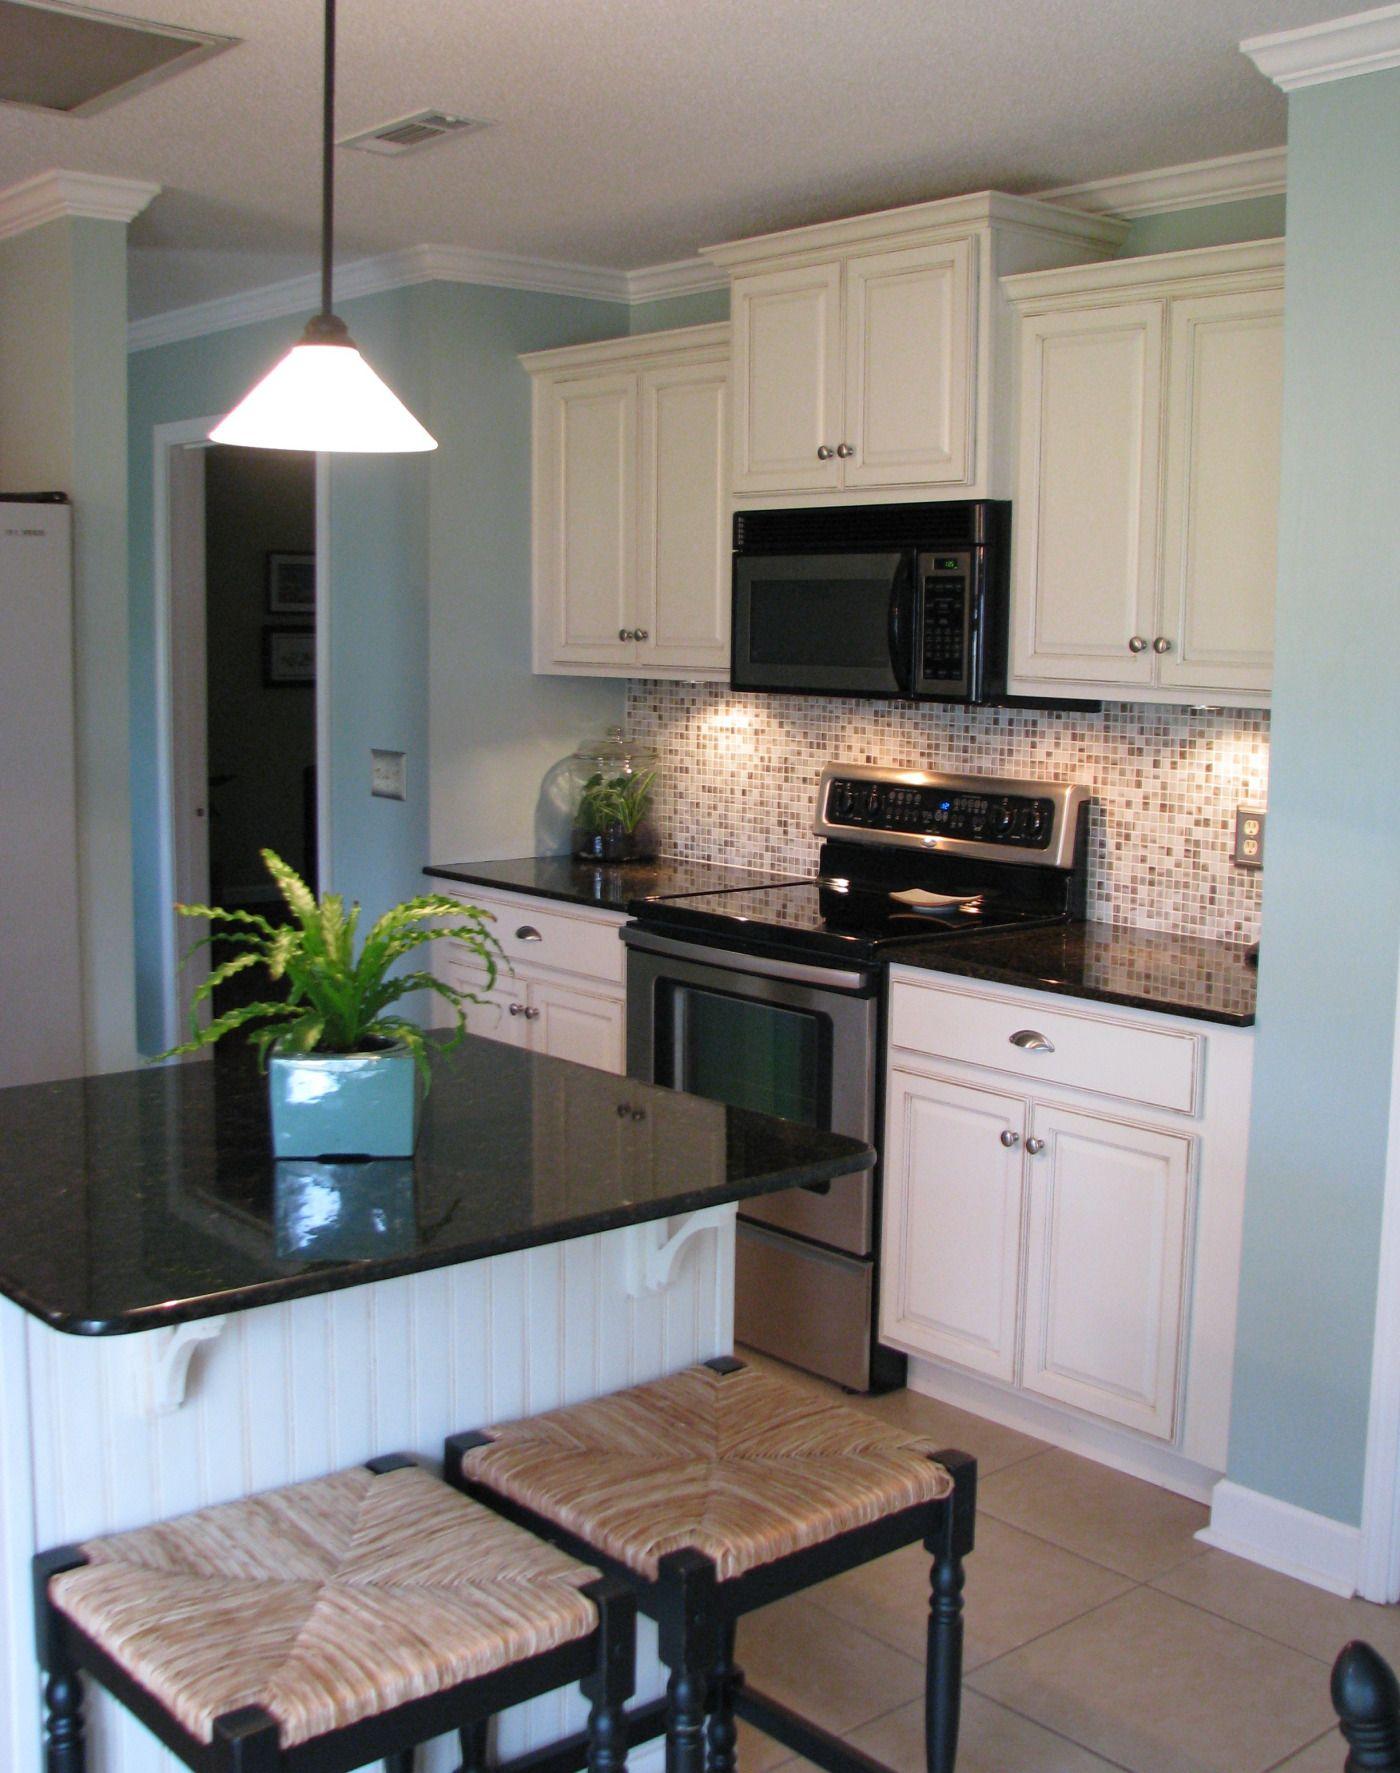 Kitchen Remodel For 5 000 Design Och Inspiration